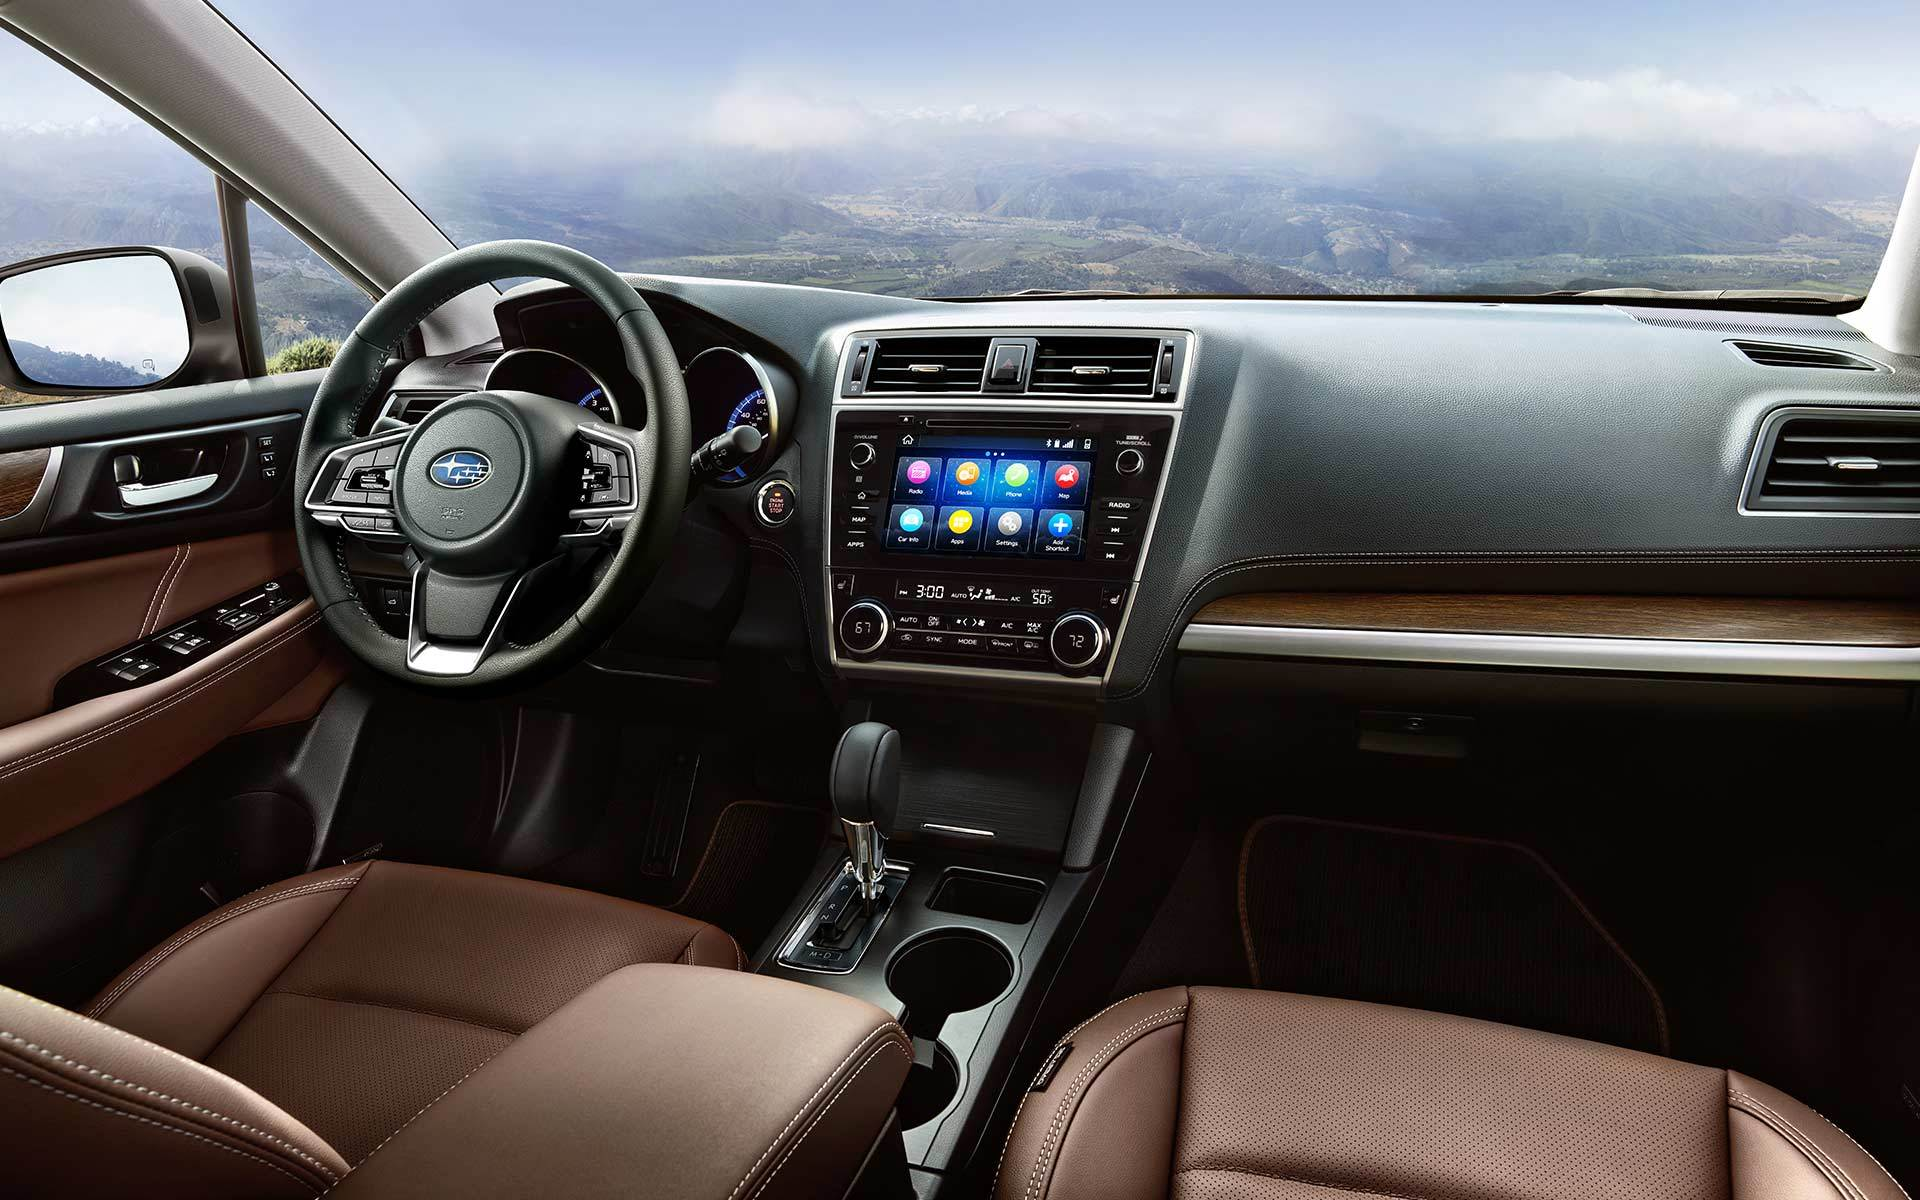 Interior of the 2018 Subaru Outback